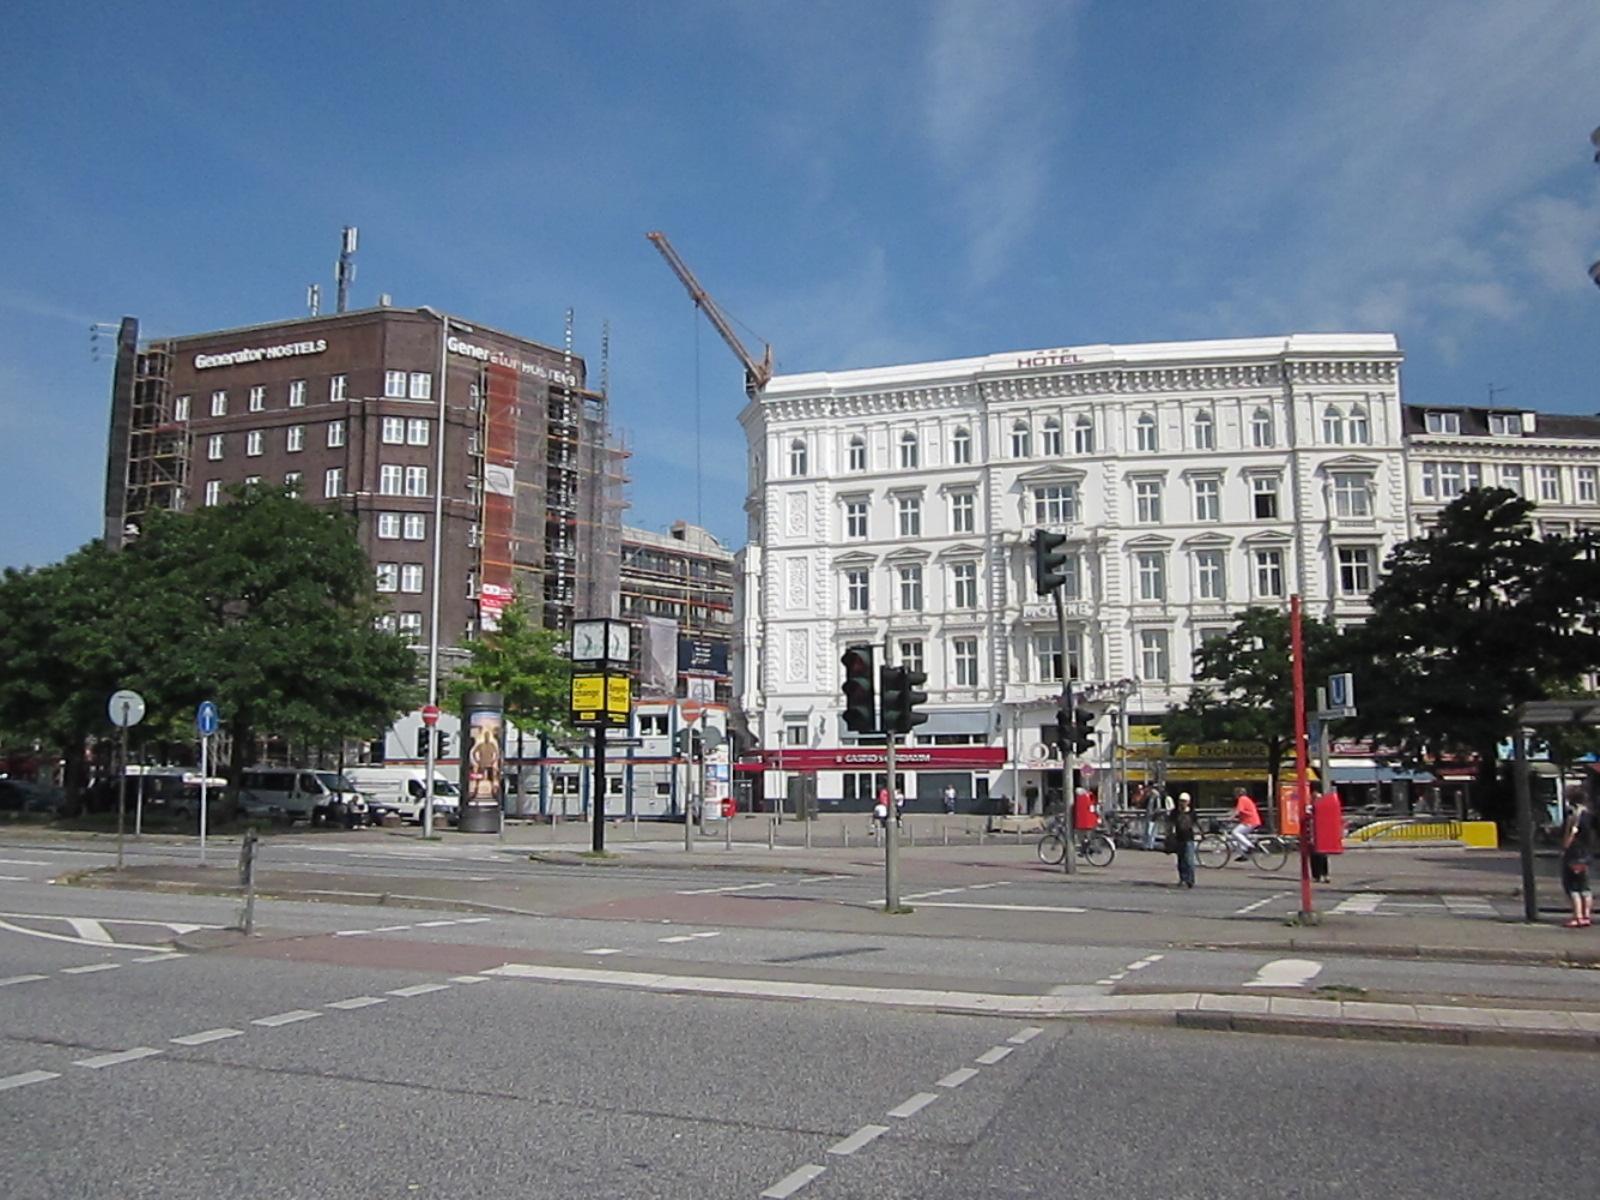 St Hotel Hamburg